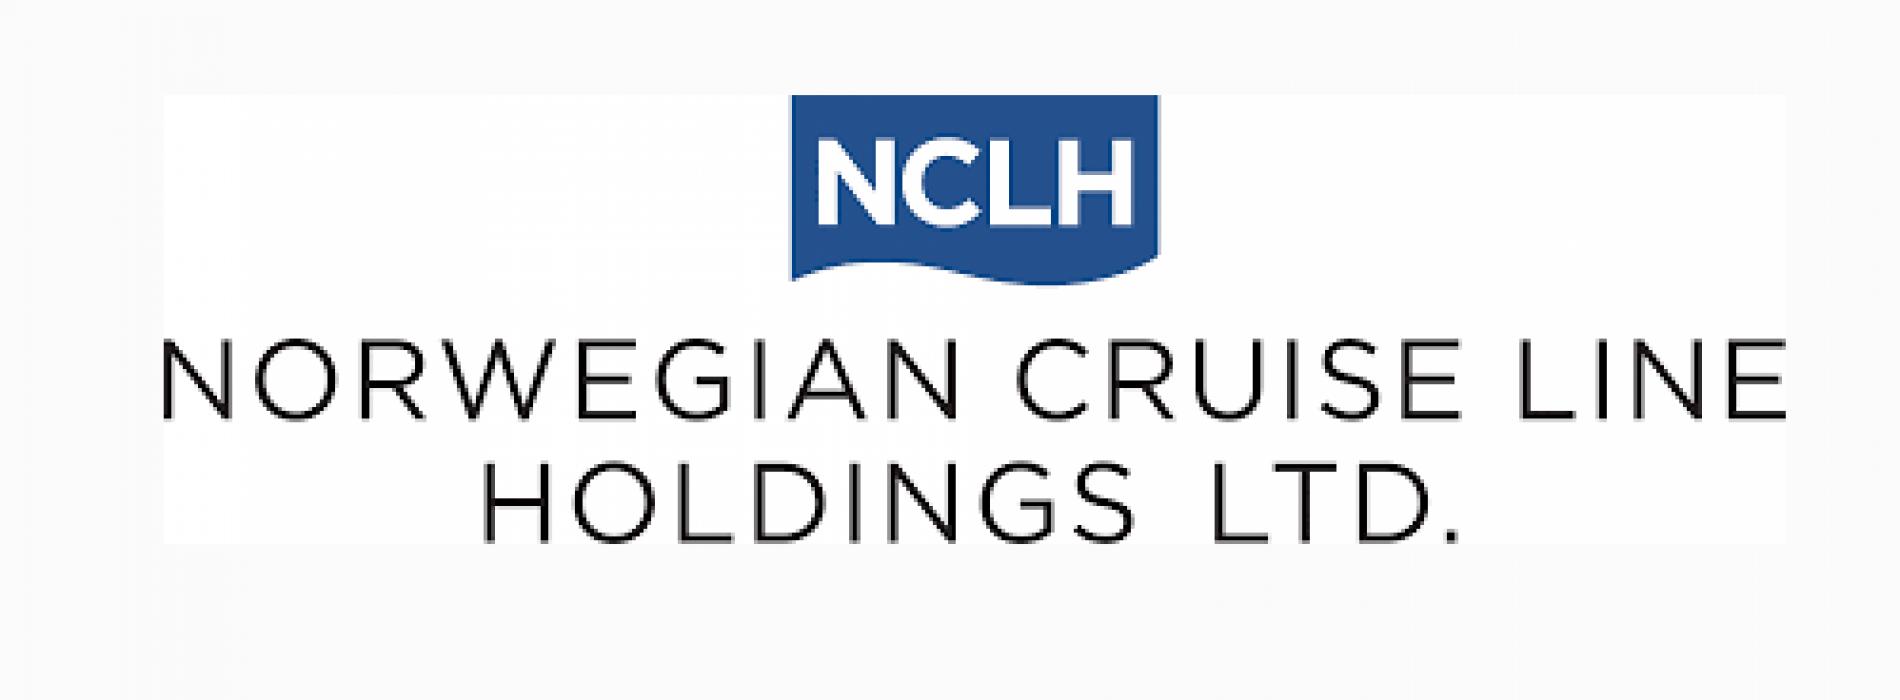 Norwegian Cruise Line Holdings announces efforts to reduce single-use plastics